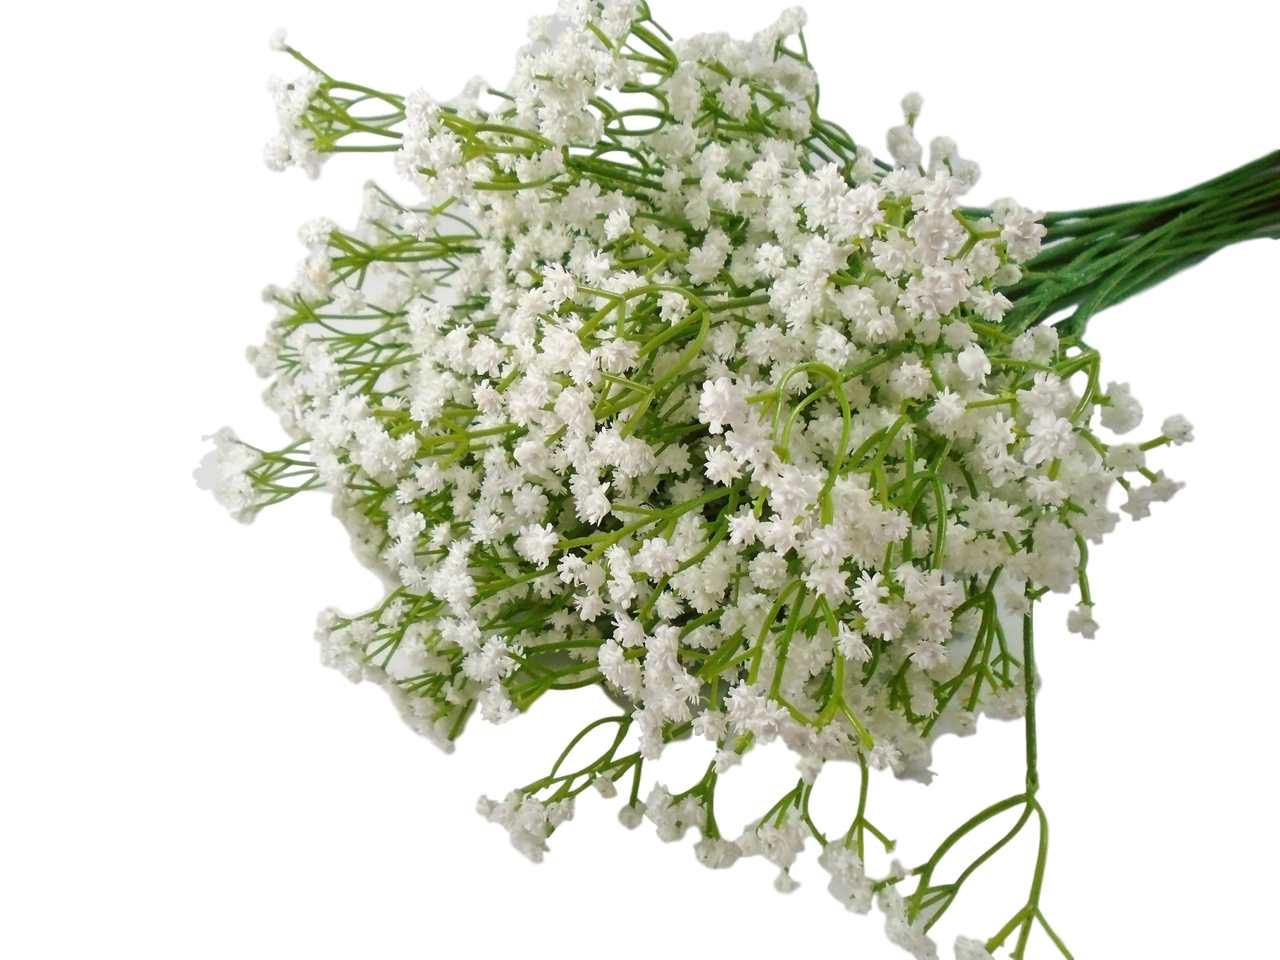 Kit flores mosquitinhos artificiais para enfeites